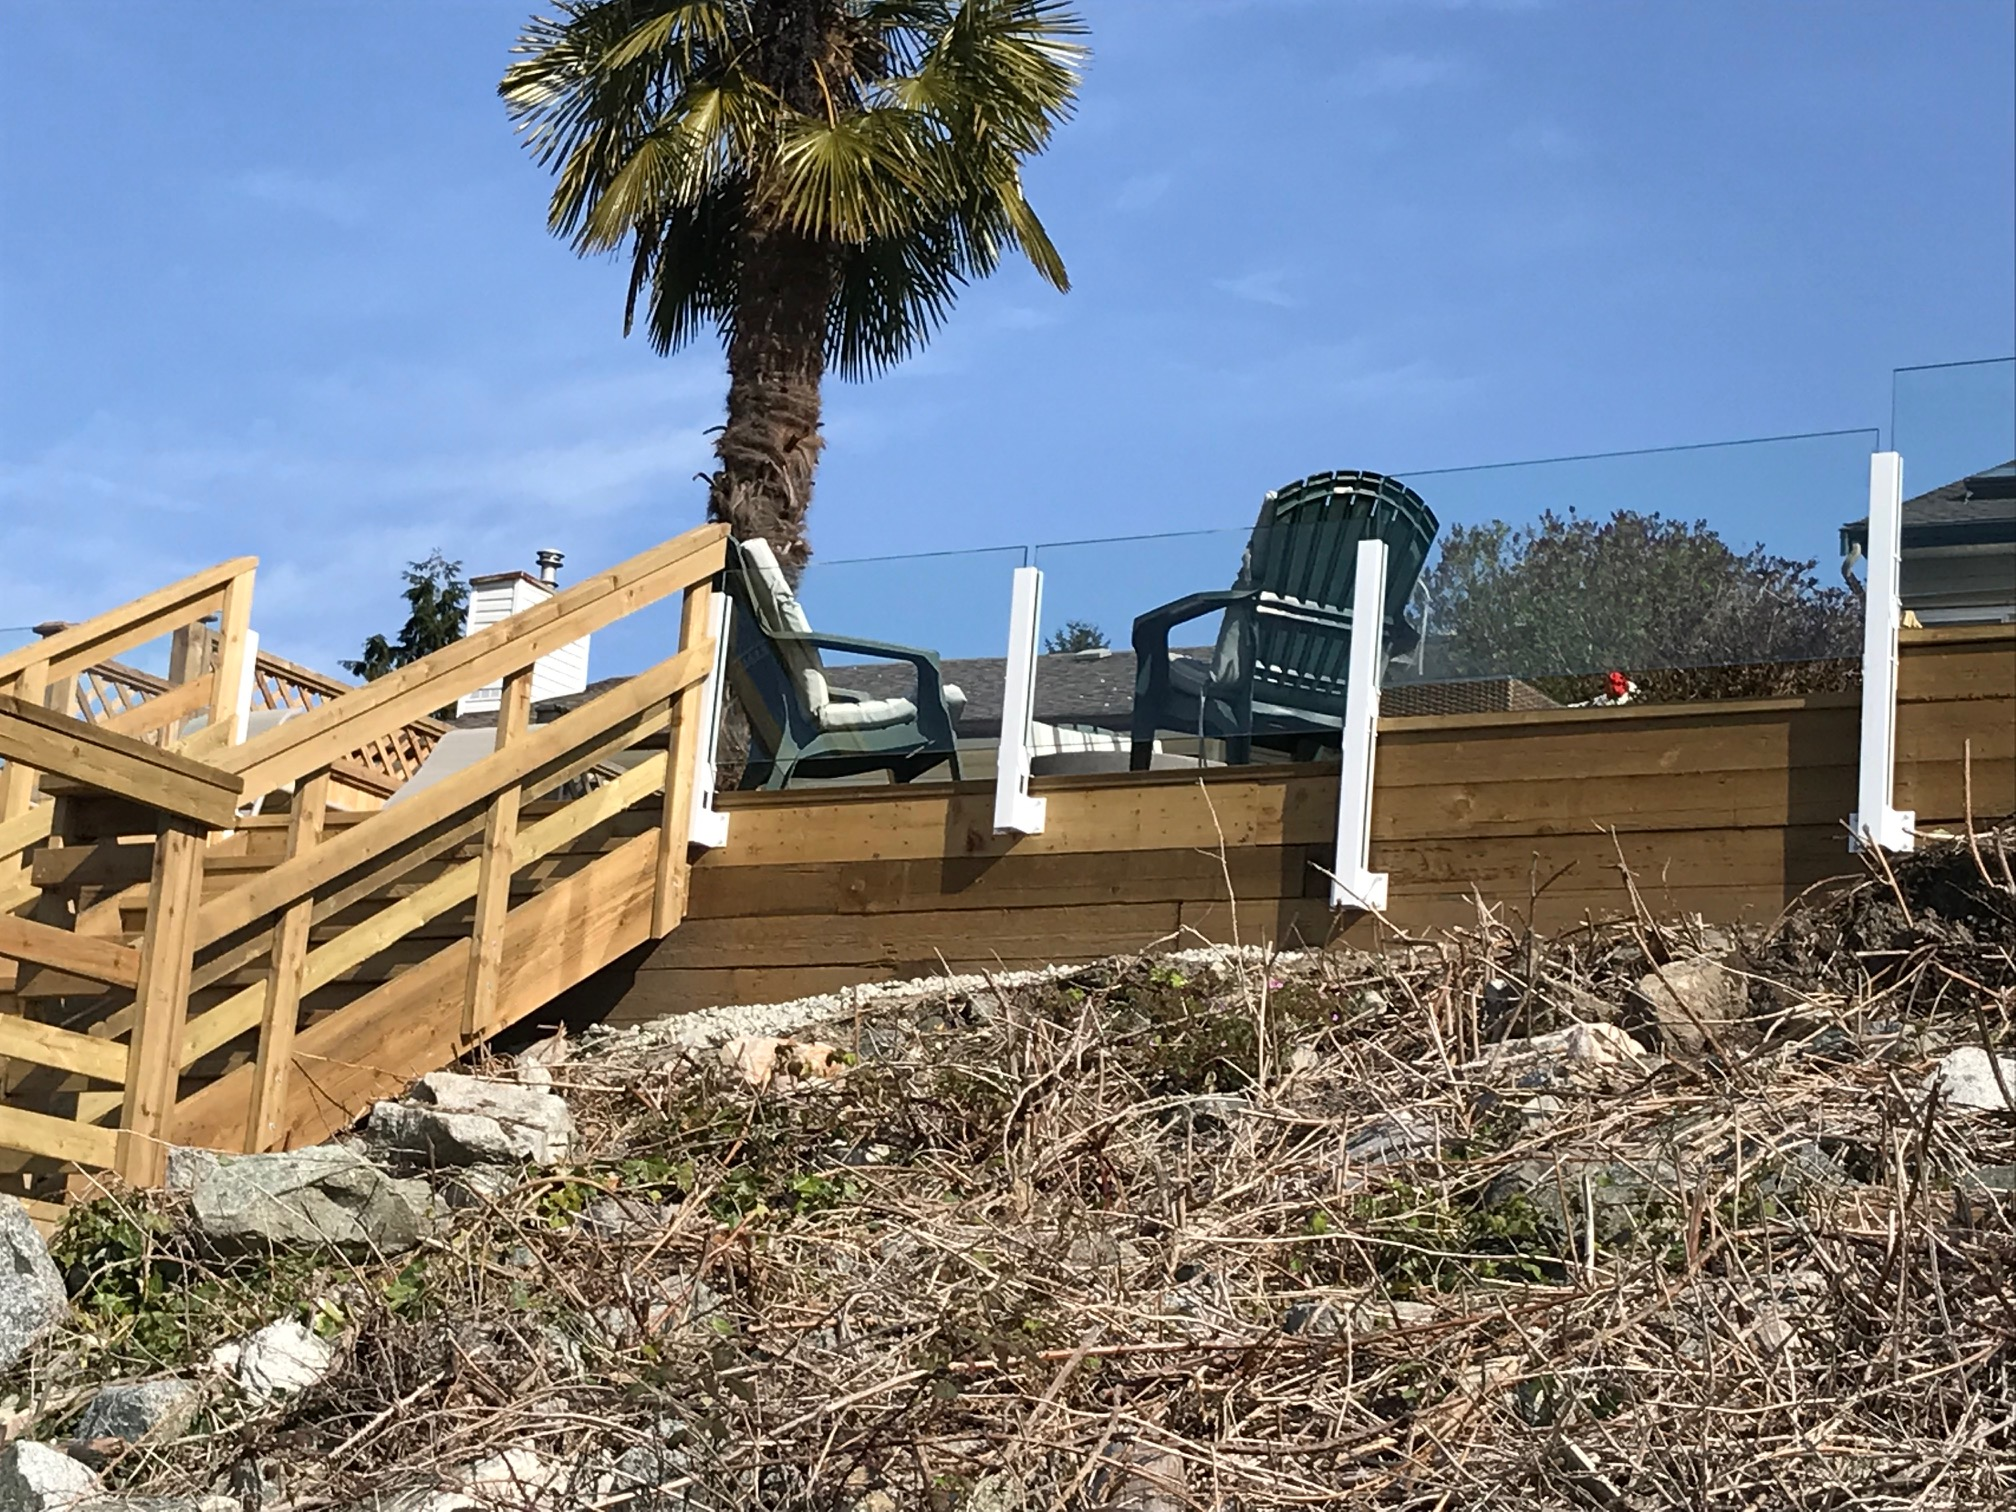 olmani-vancouver-patio-sun-deck-renovation-7.jpg